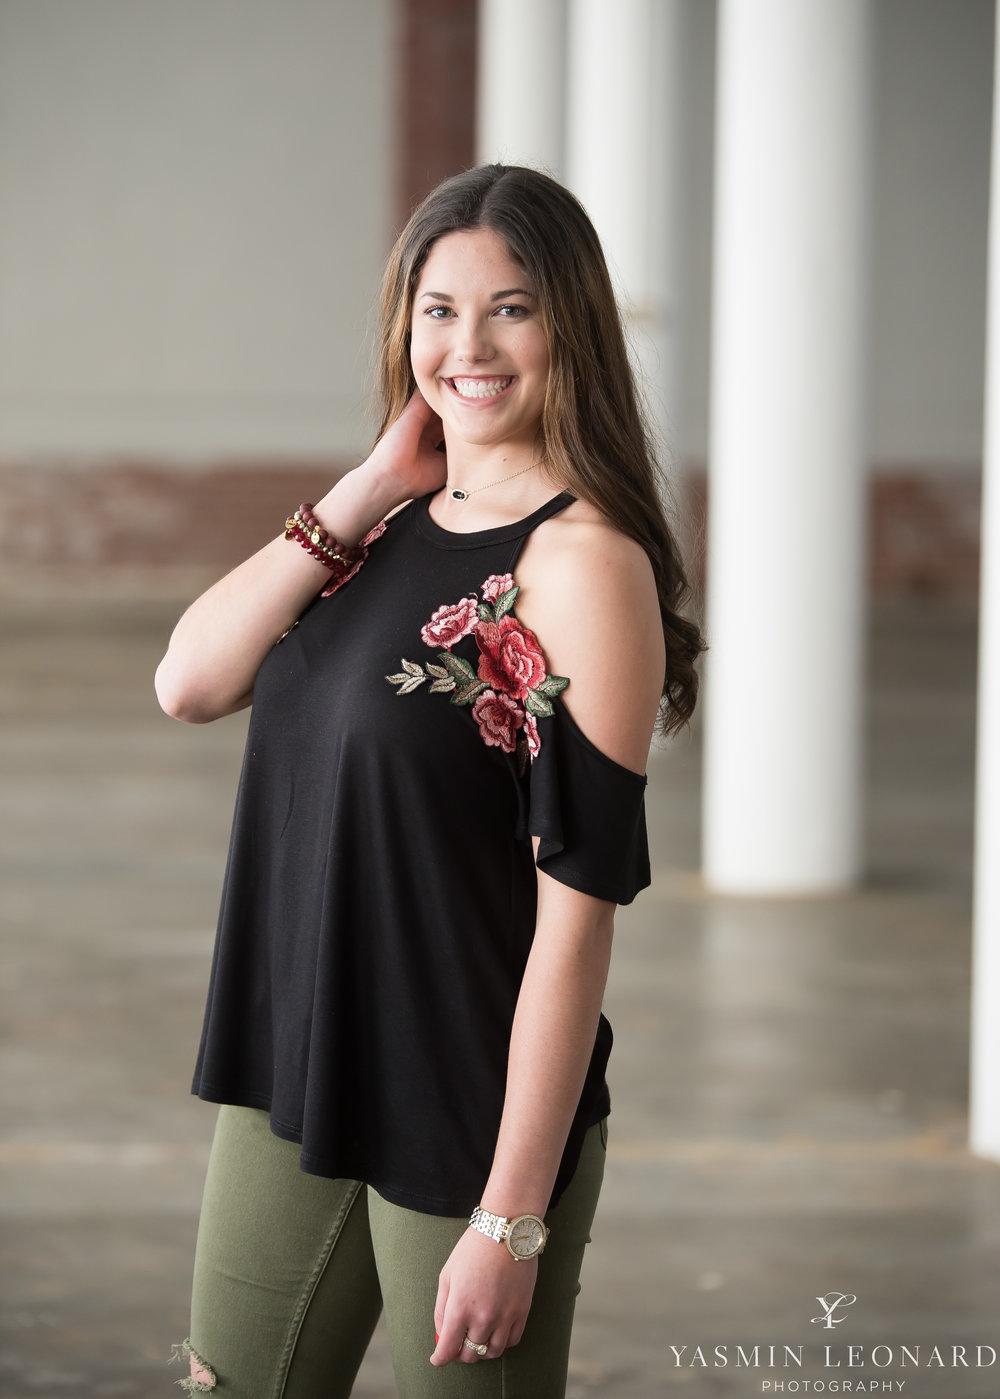 YLP Senior Model Team - Yasmin Leonard Photography - Evan-2.jpg